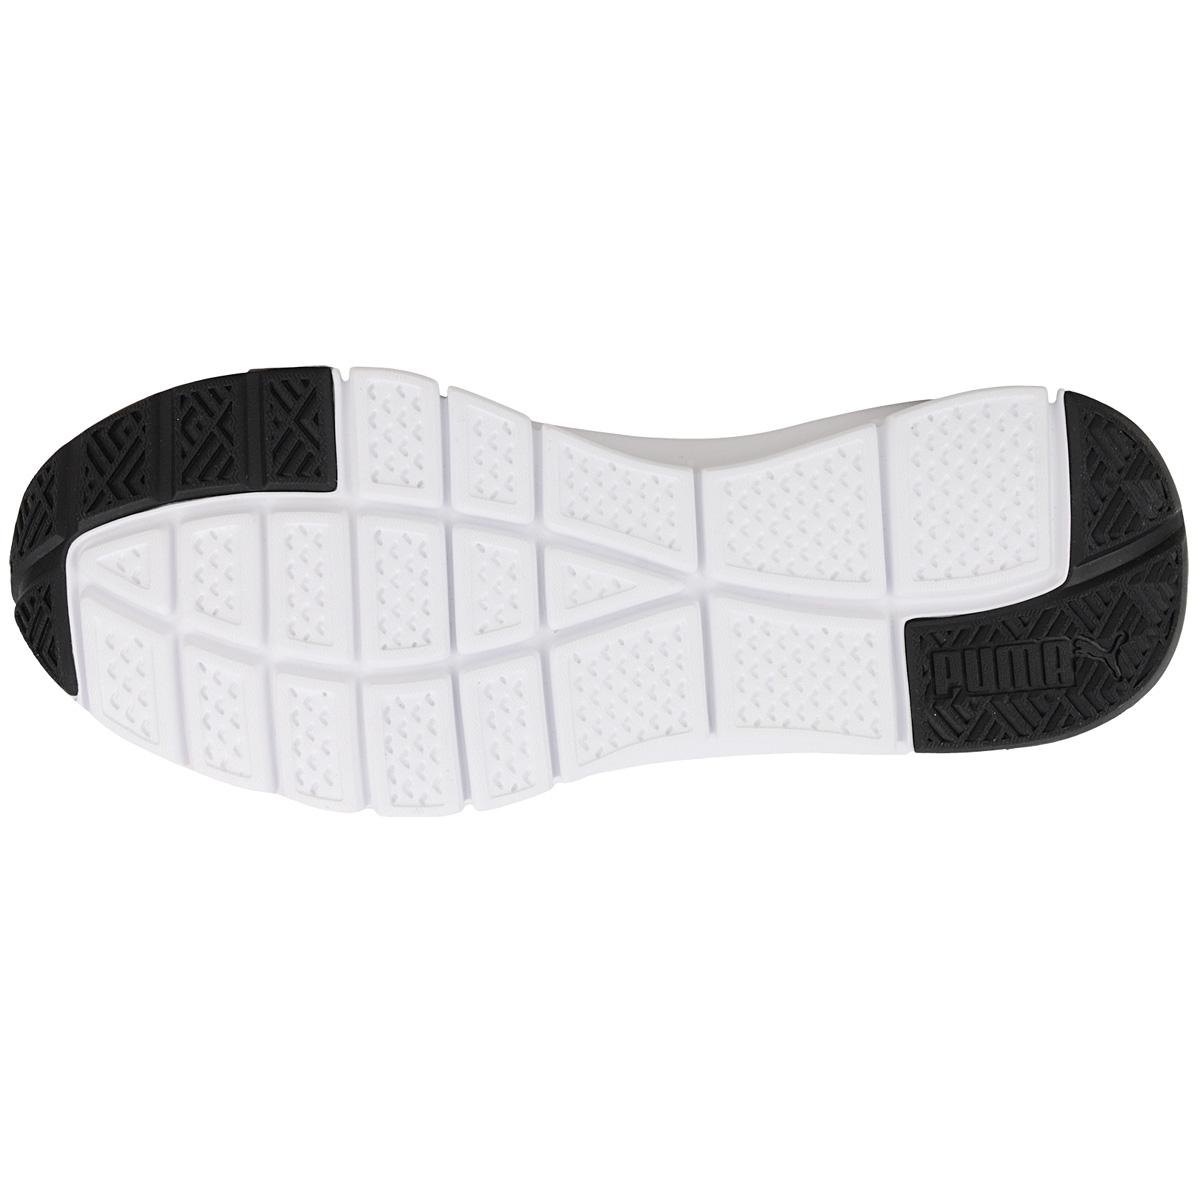 fc9332cd6c5 Puma Flexracer Zapatos Negros Zapatillas de Hombre para Correr ...